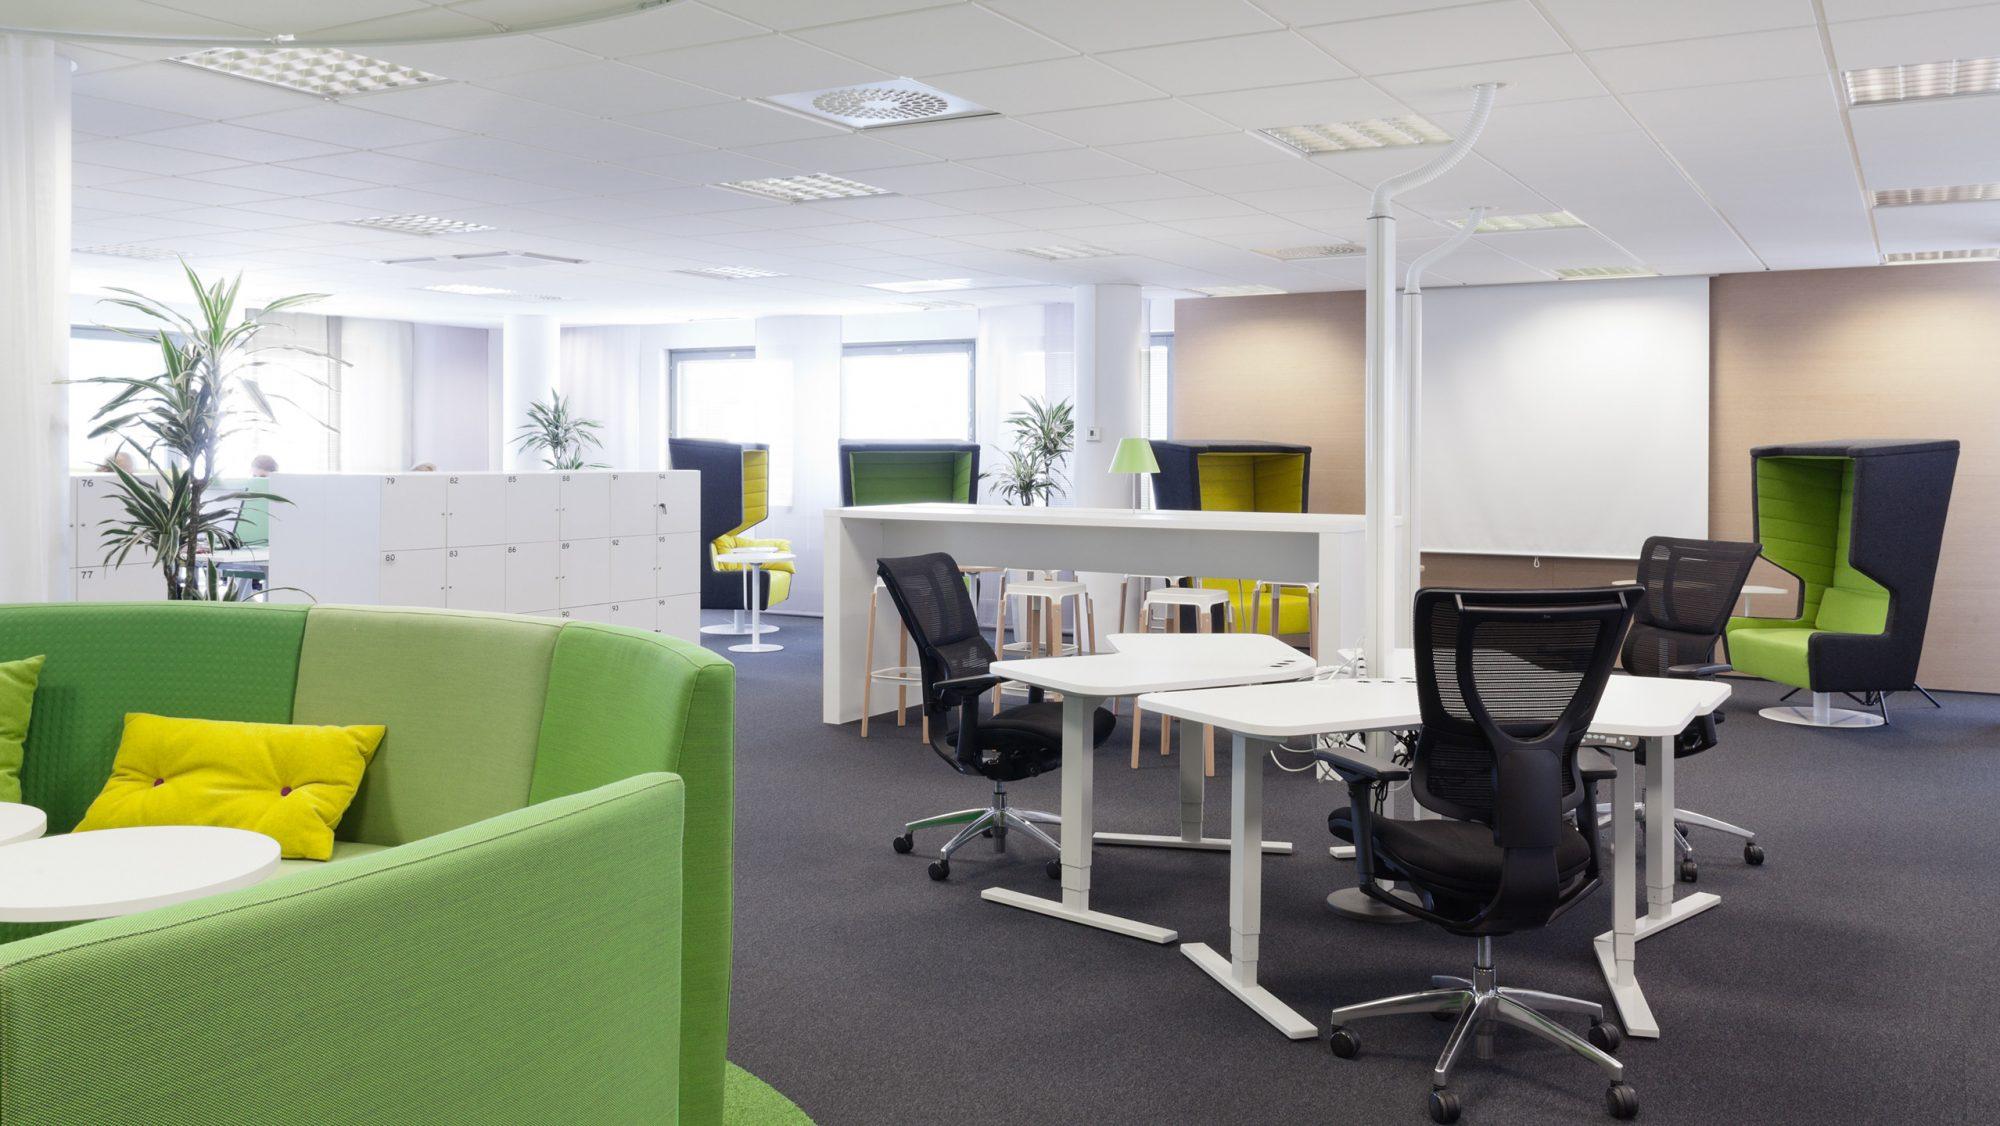 City-of-Espoo-Mayor's-office-GI-Project-5